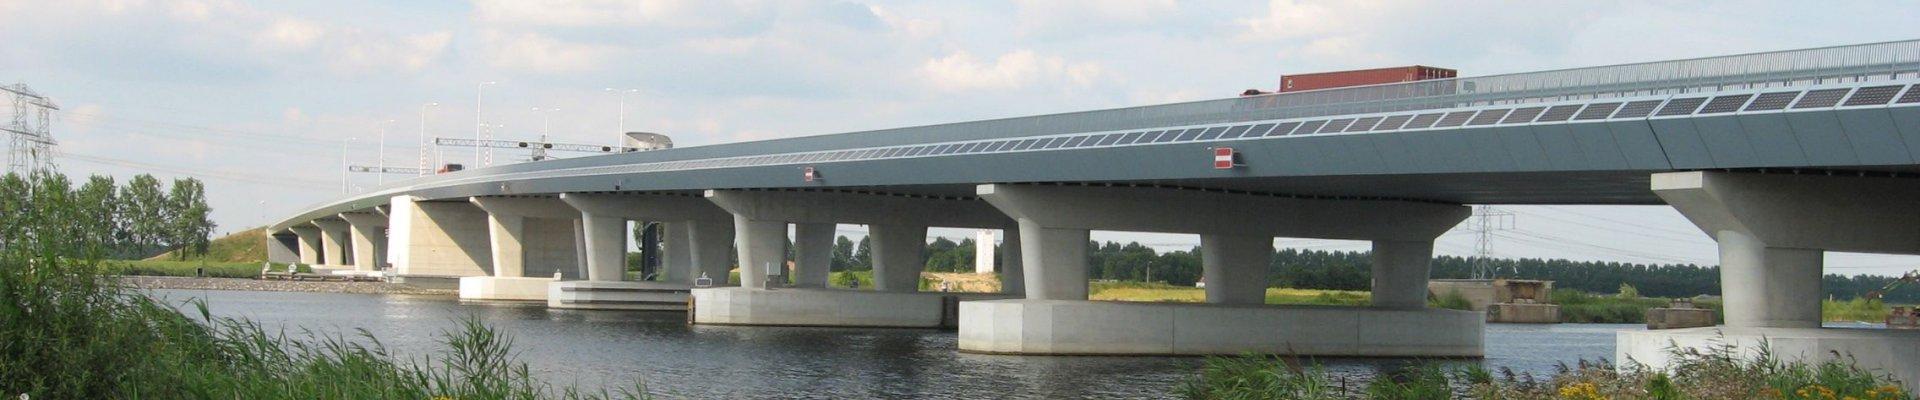 Brug-RHE-Ramspol-0011920x400-1